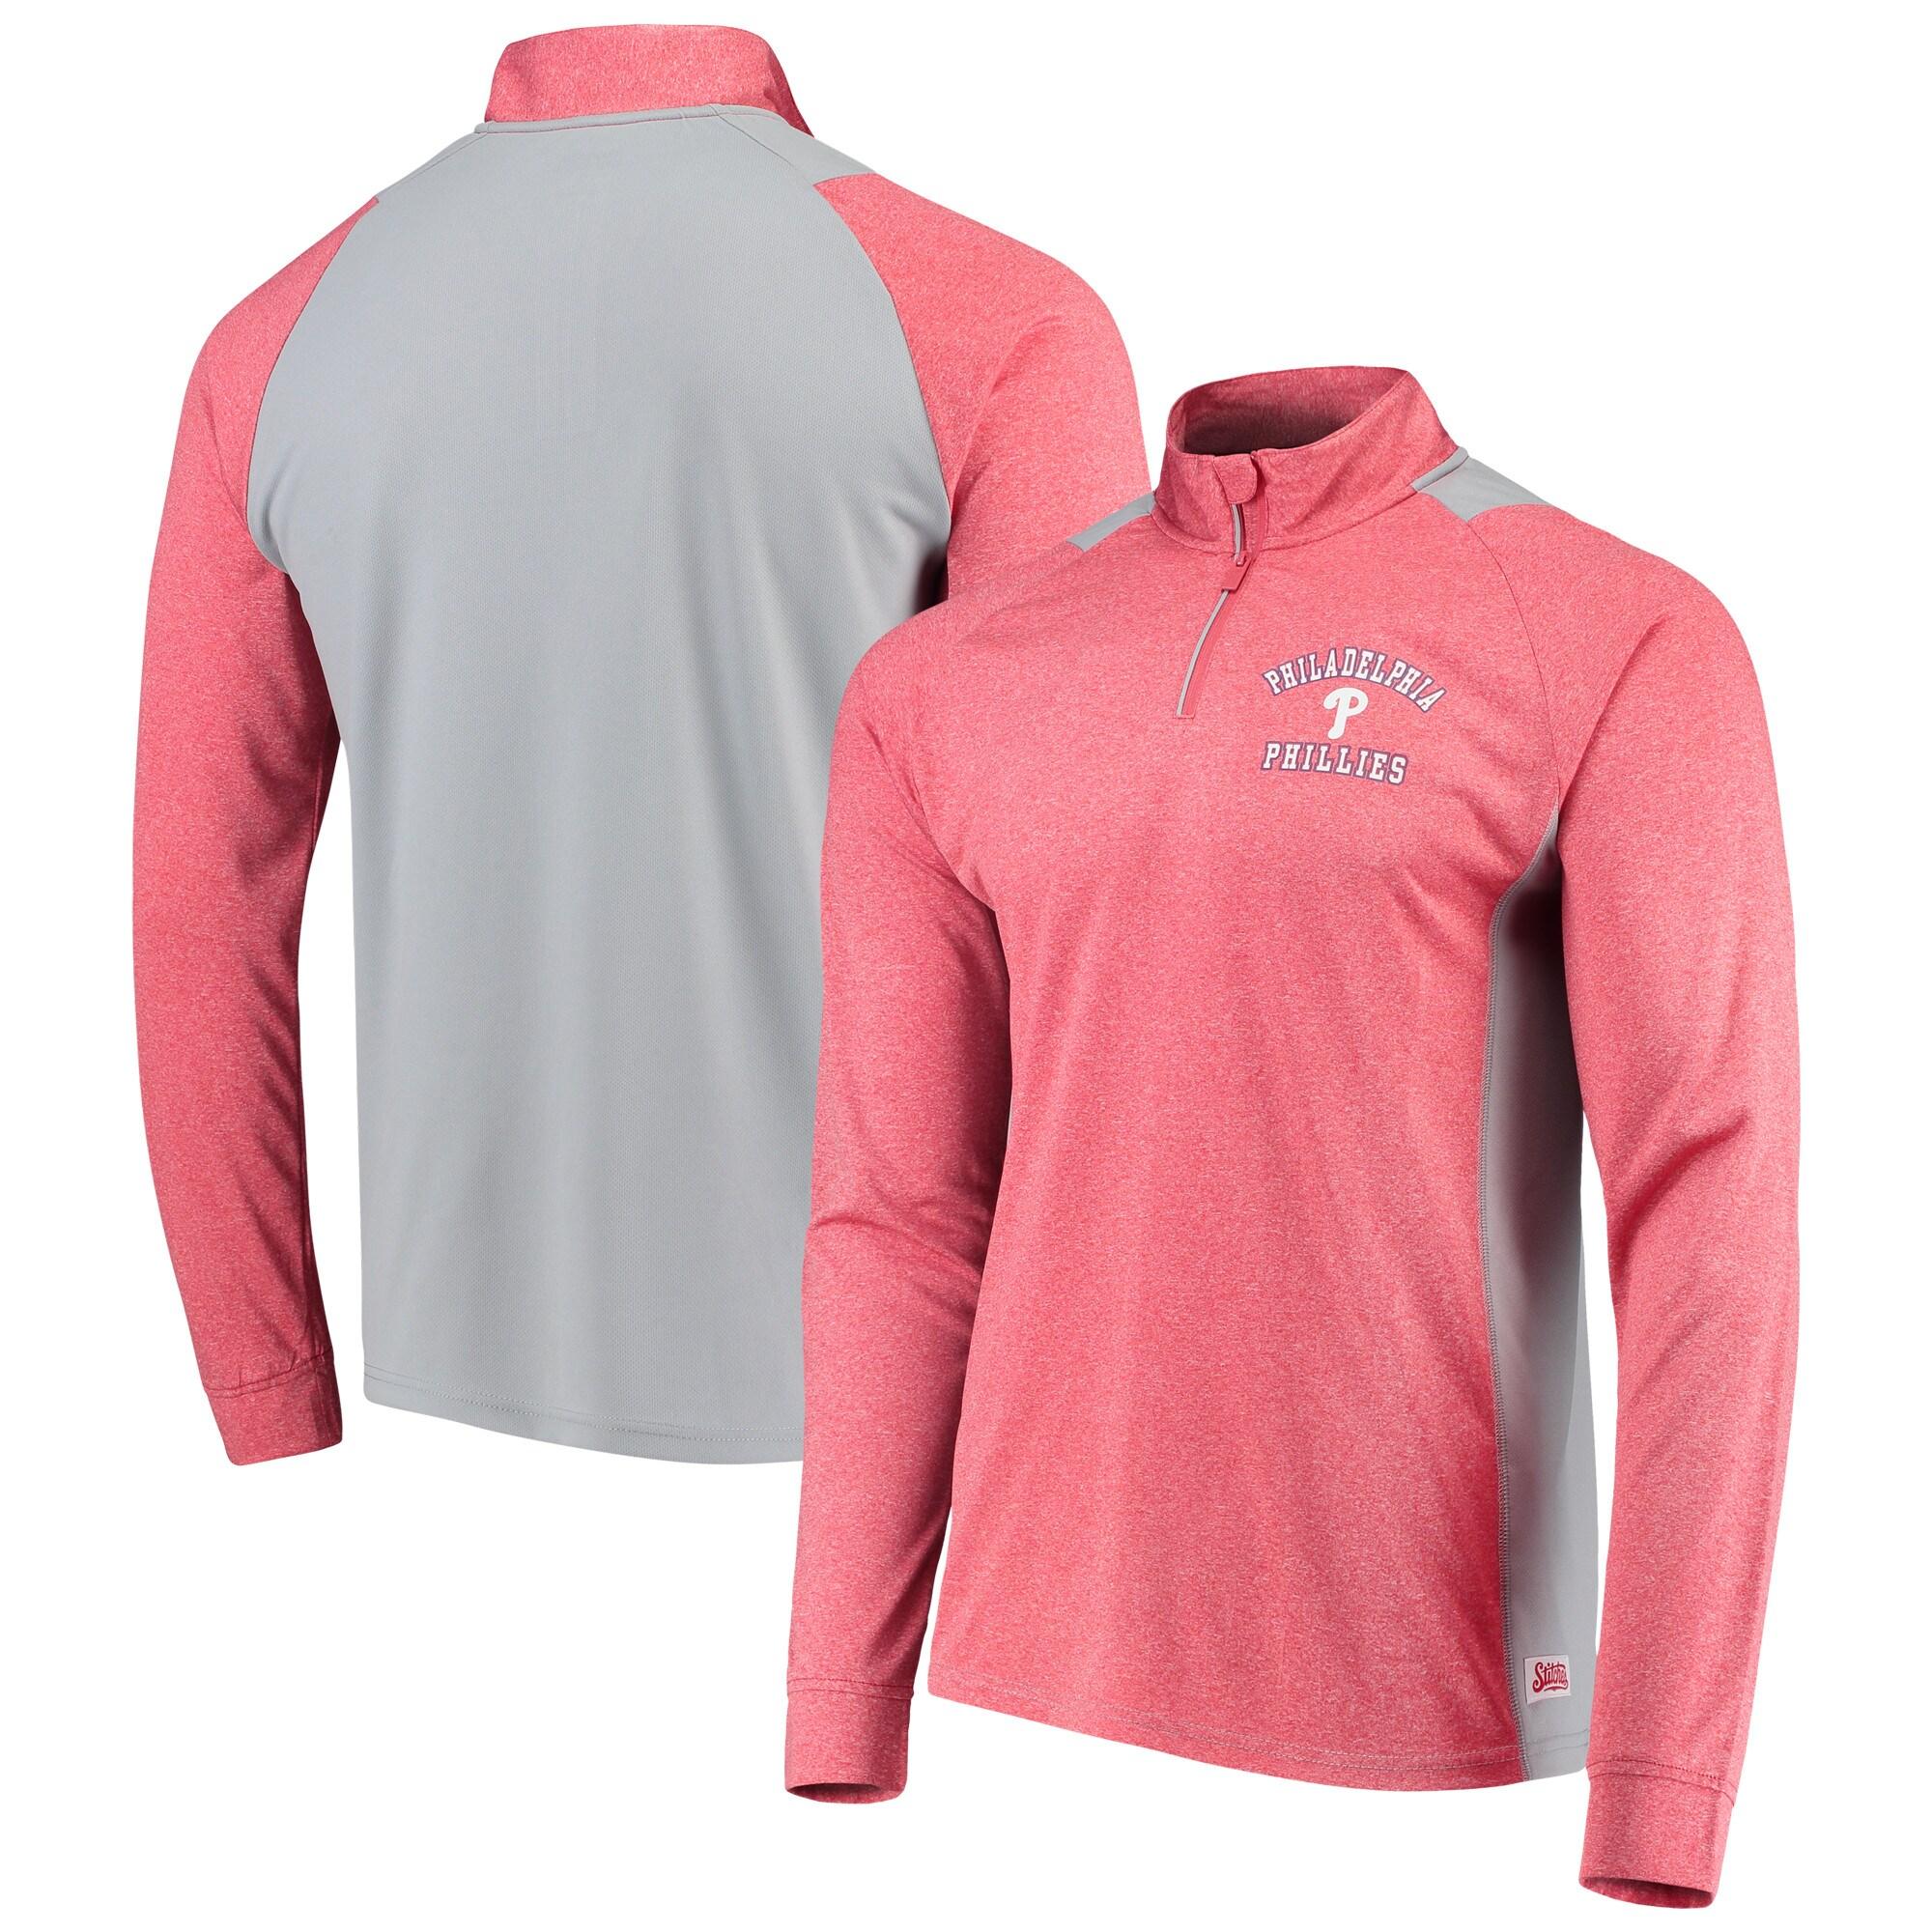 Philadelphia Phillies Stitches Raglan Sleeve Quarter-Zip Pullover Jacket - Heathered Red/Gray